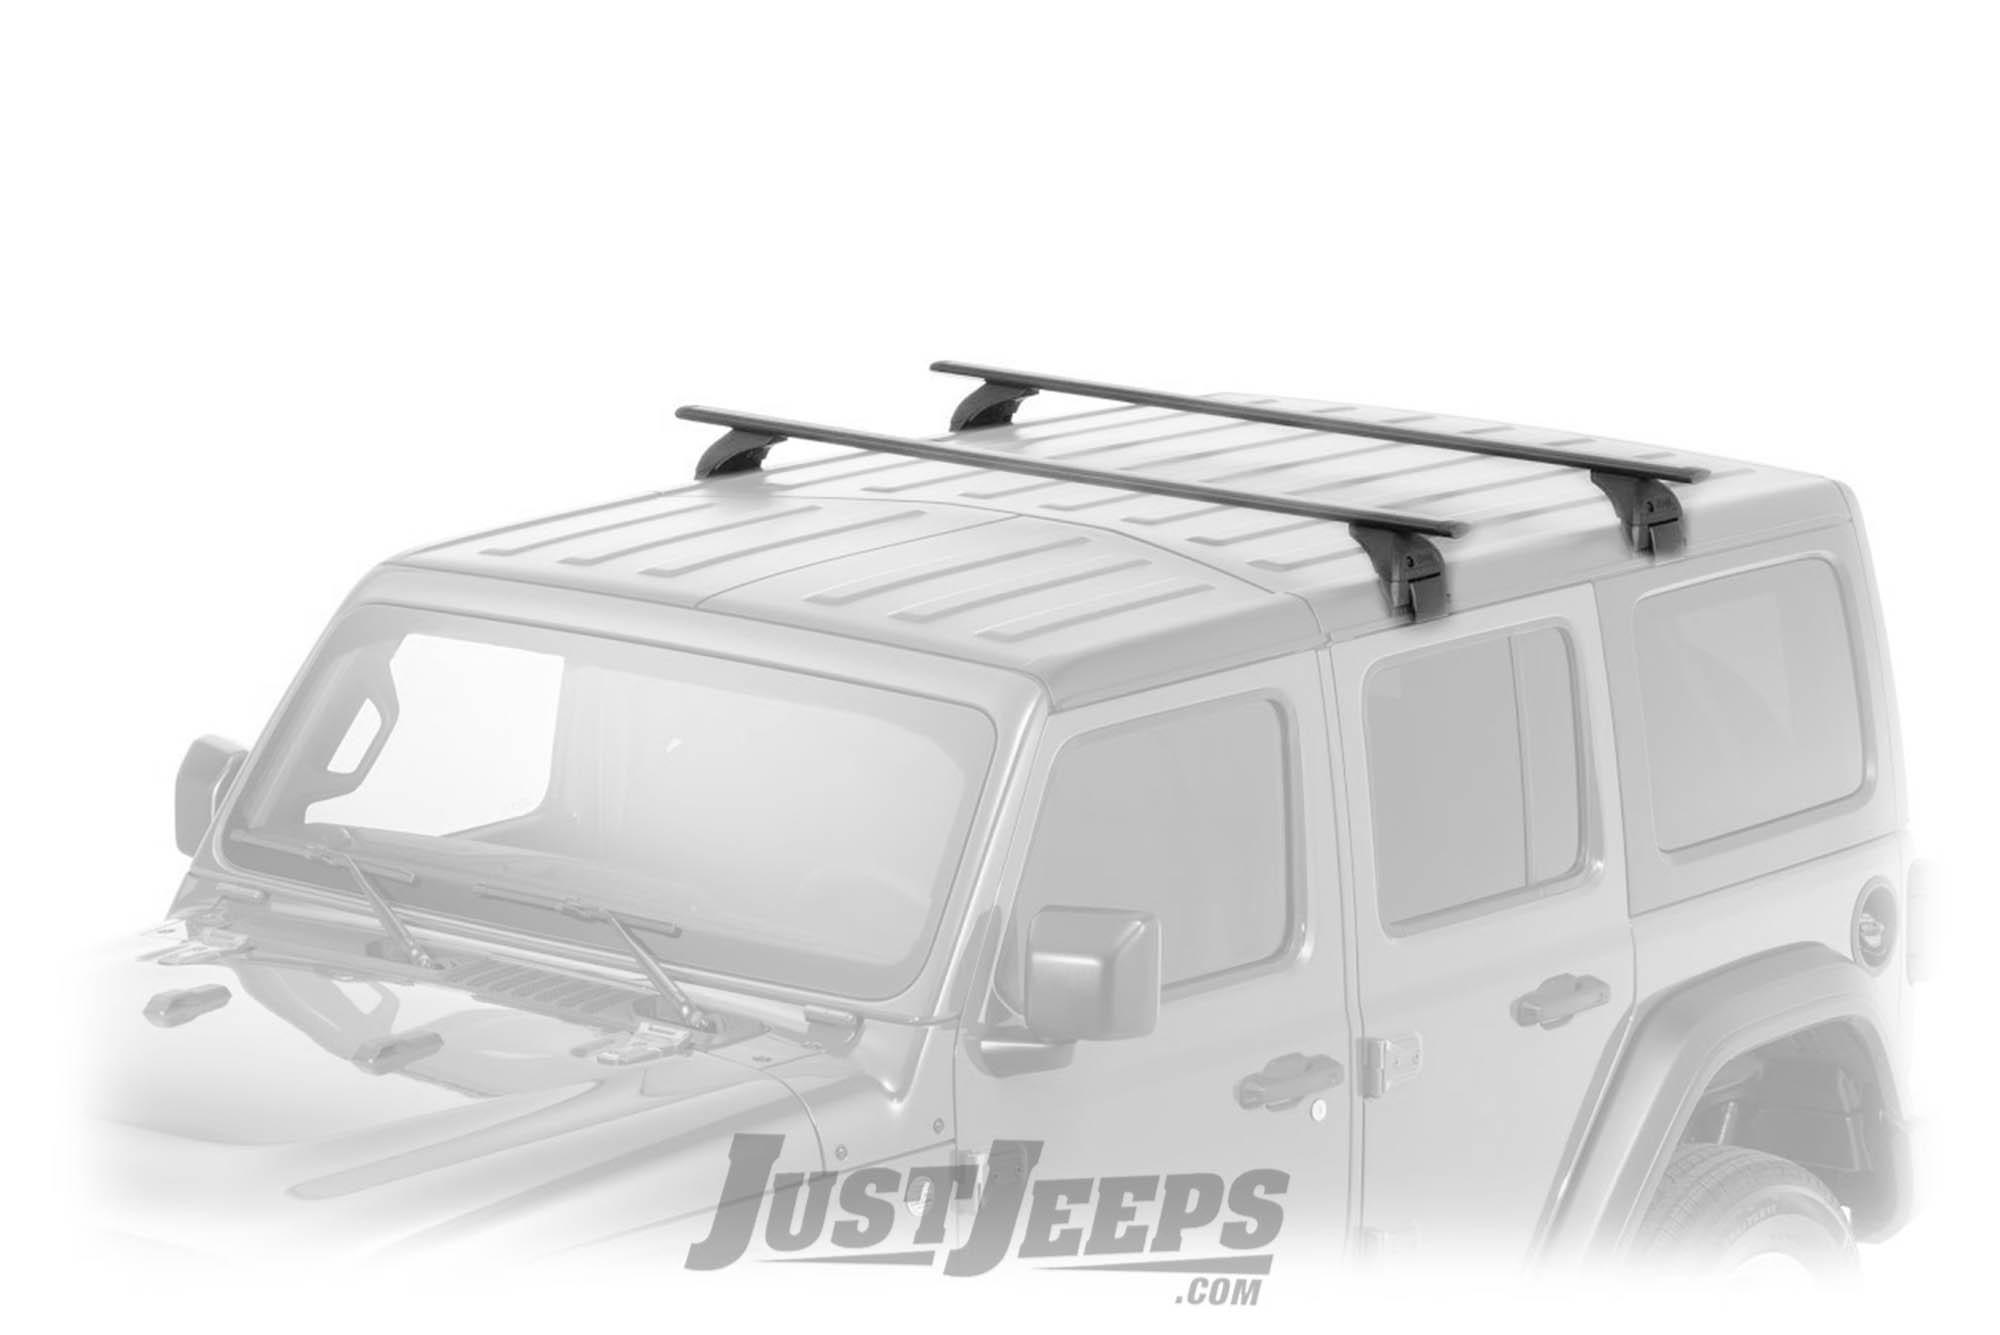 b793203491bb MOPAR Removable Roof Rack Kit For 2018+ Jeep Wrangler JL 2 Door & Unlimited  4 Door Models